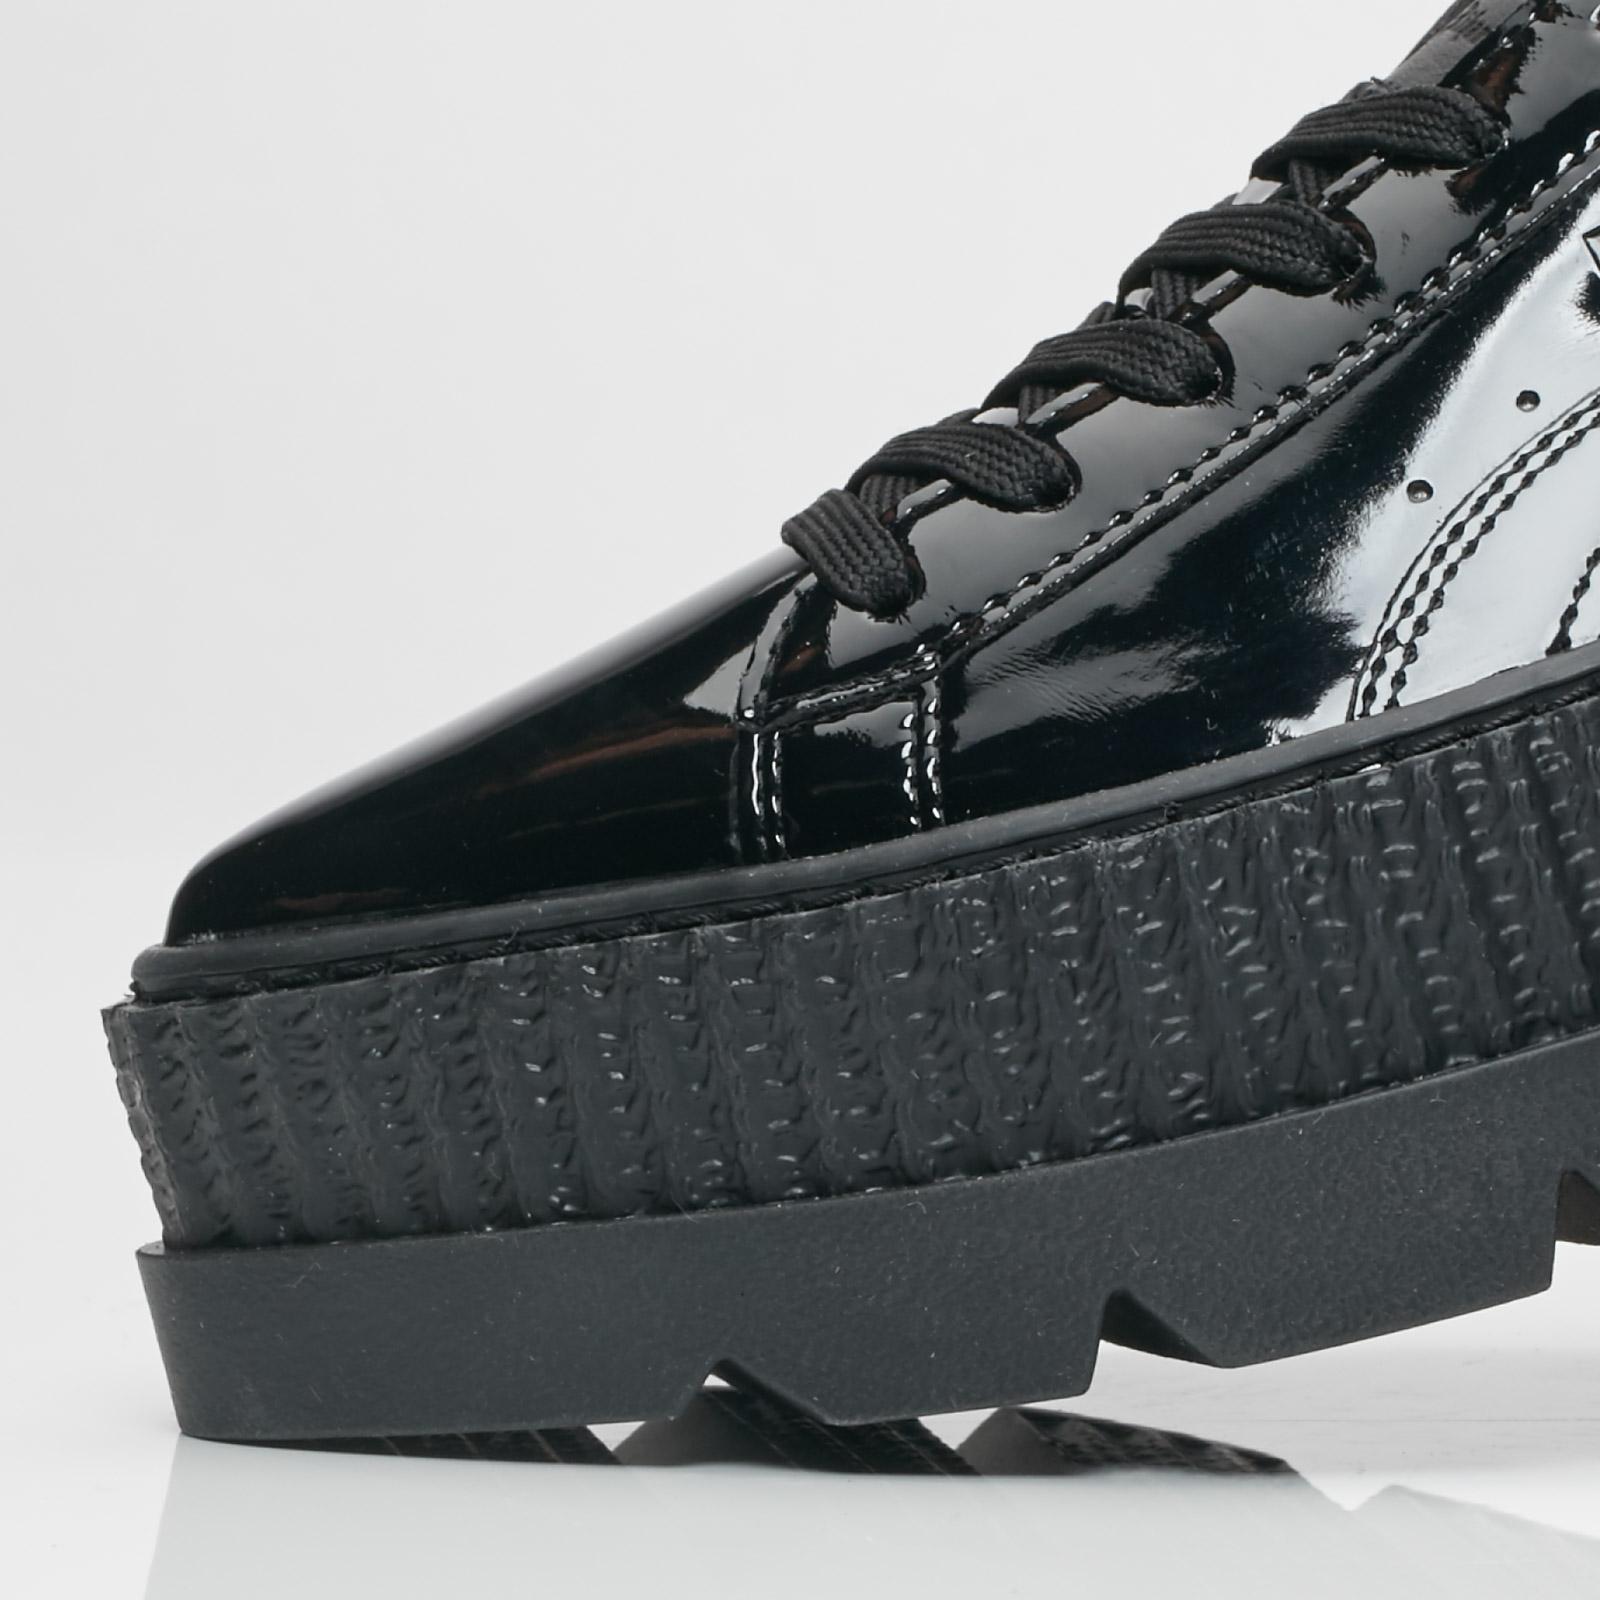 super popular d97f6 b6dea Puma Pointy Creeper Patent Wns - 366270-01 - Sneakersnstuff ...